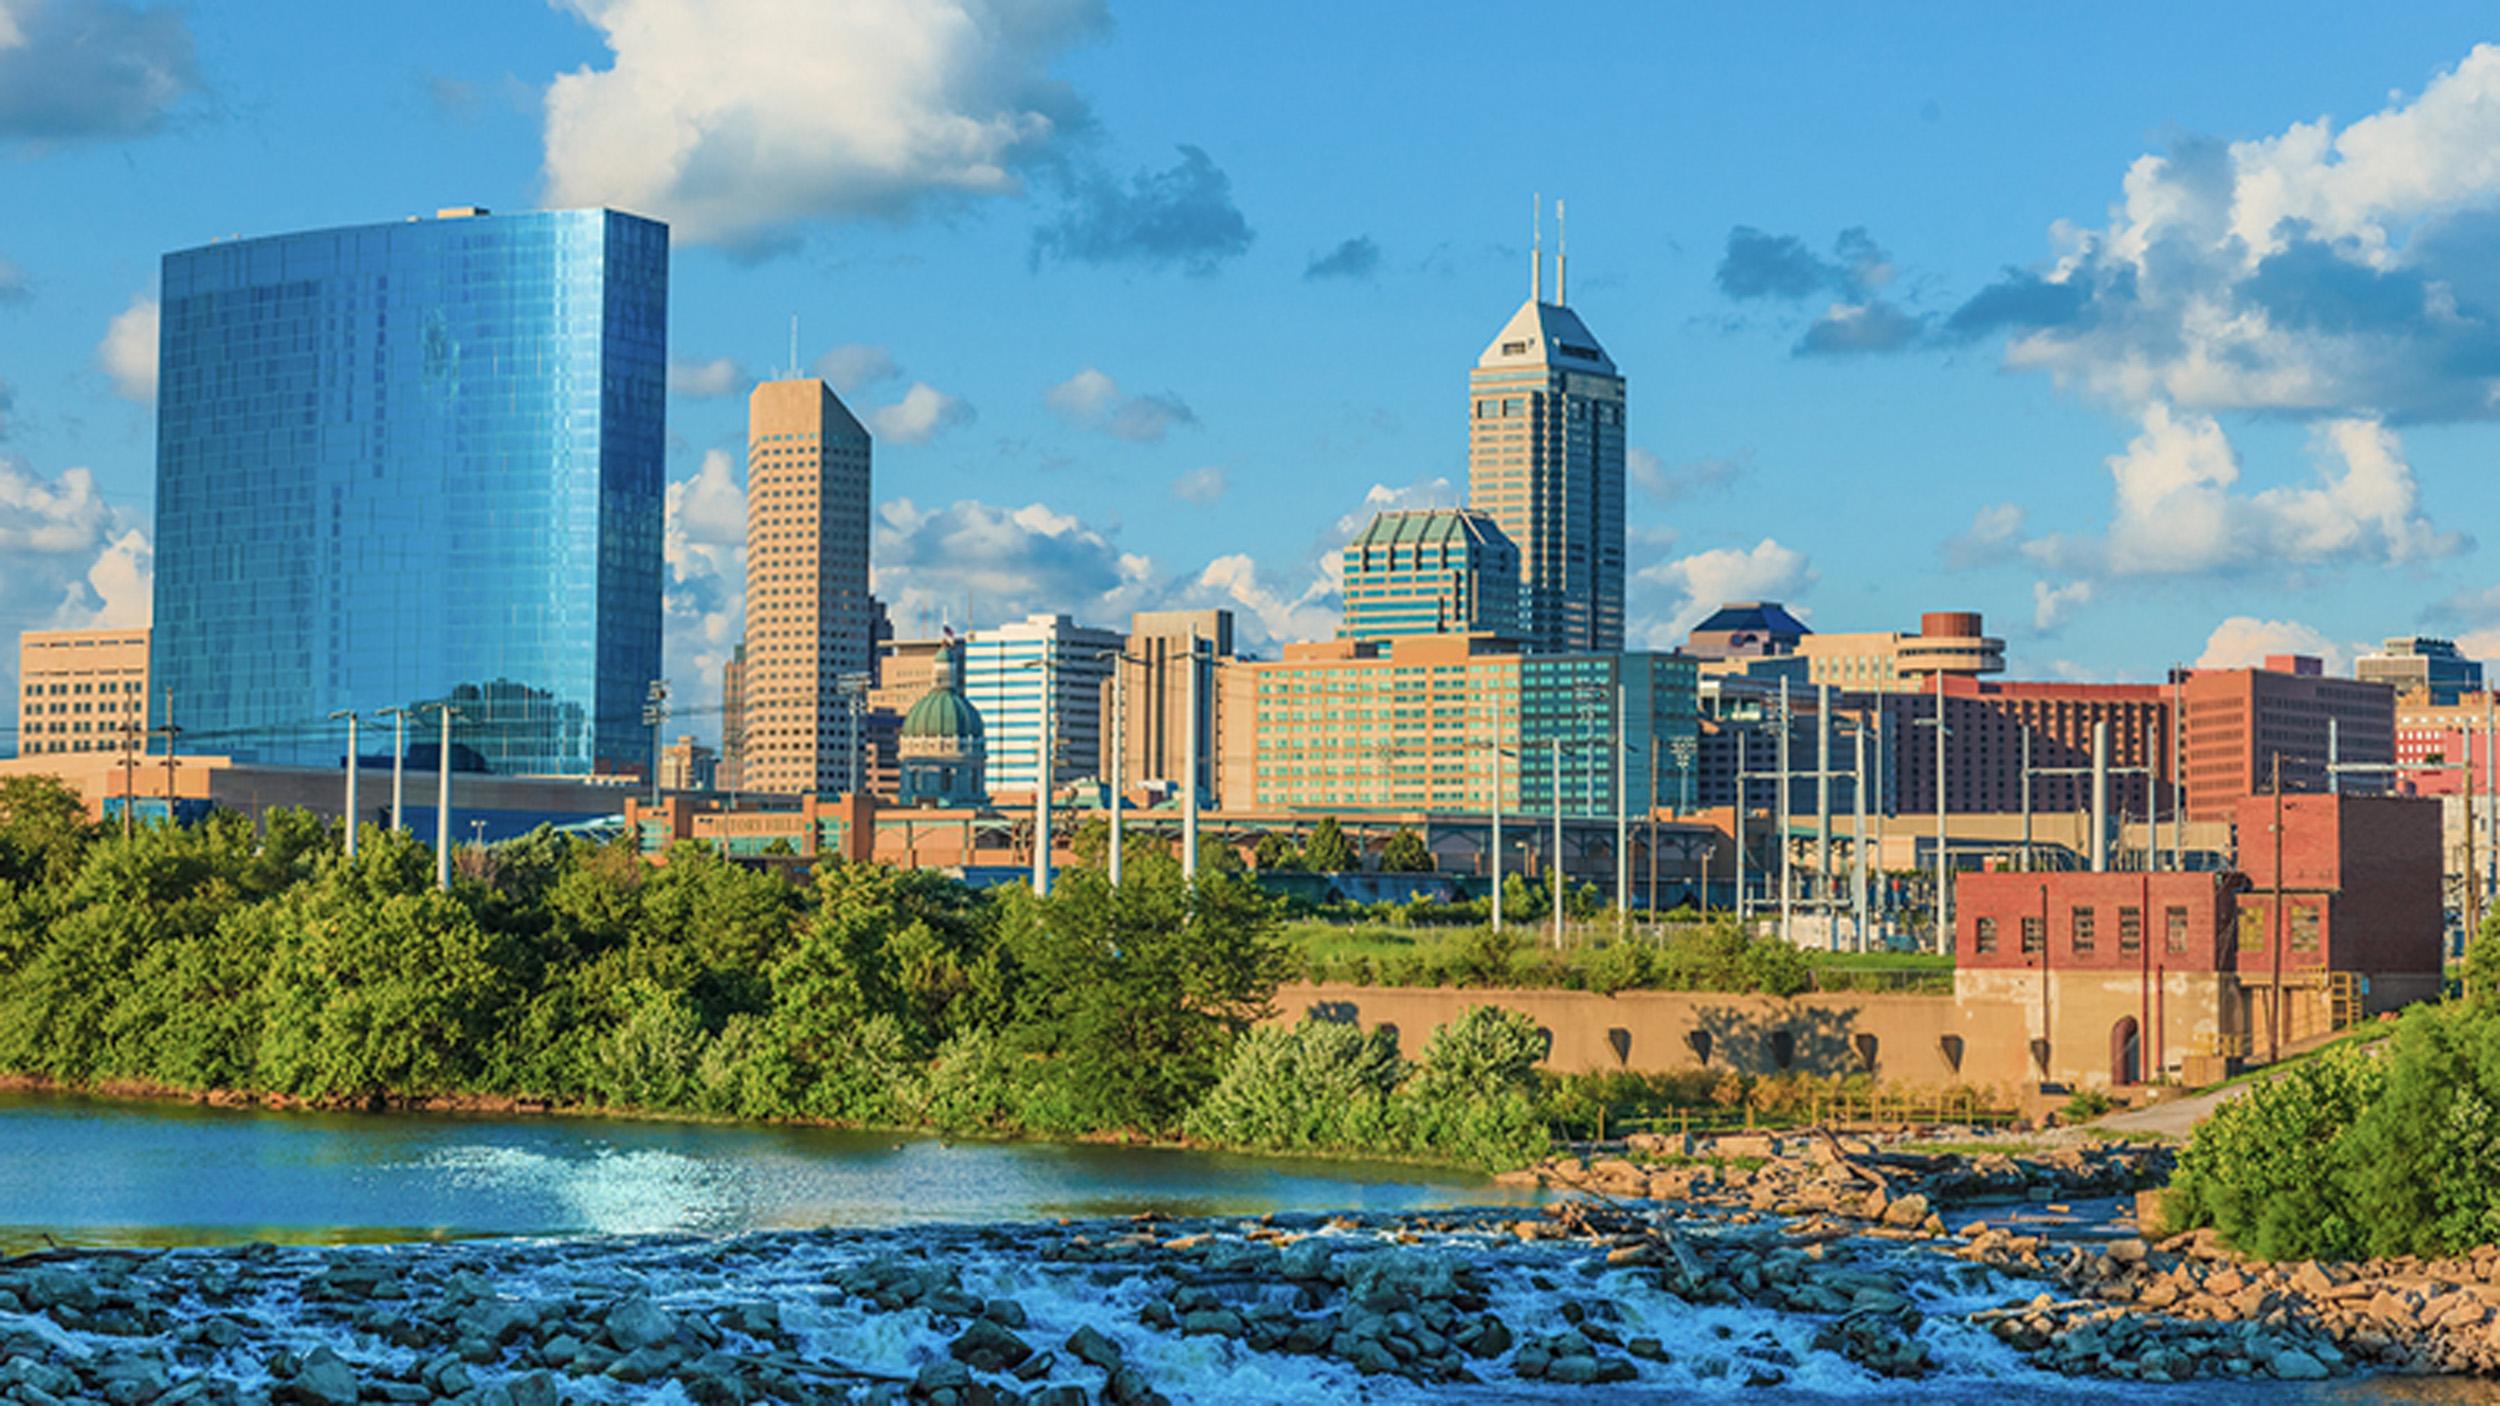 Indy skyline.jpg